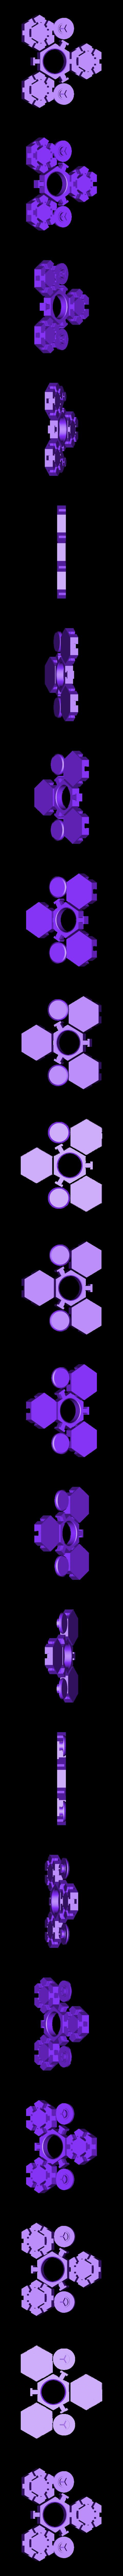 starter_set.stl Download free STL file Hex Tile Fidget Spinner • 3D printing object, CyberCyclist